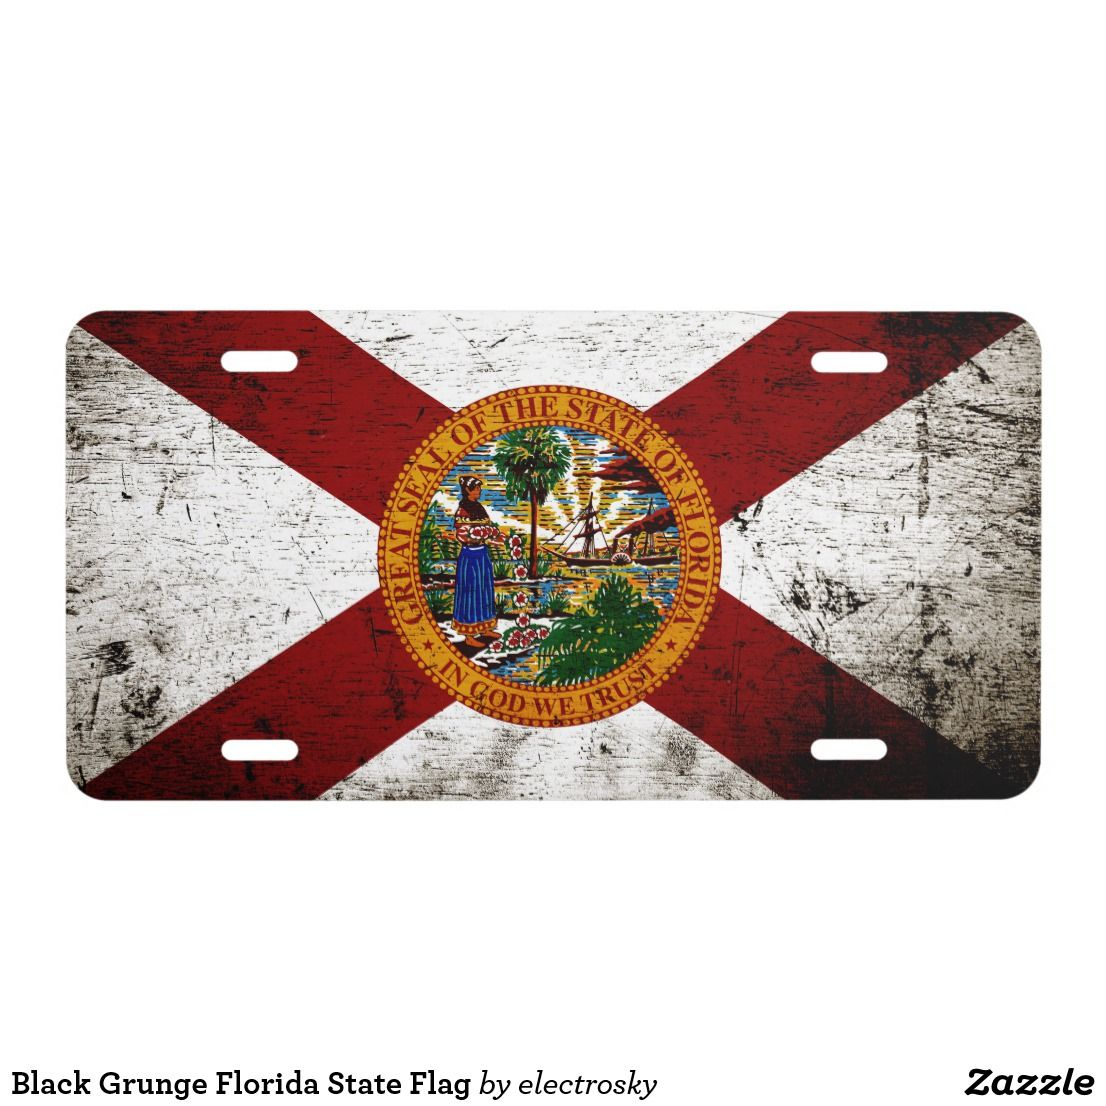 Black Grunge Florida State Flag License Plate Zazzle Com Florida State Flag State Flags Black Grunge